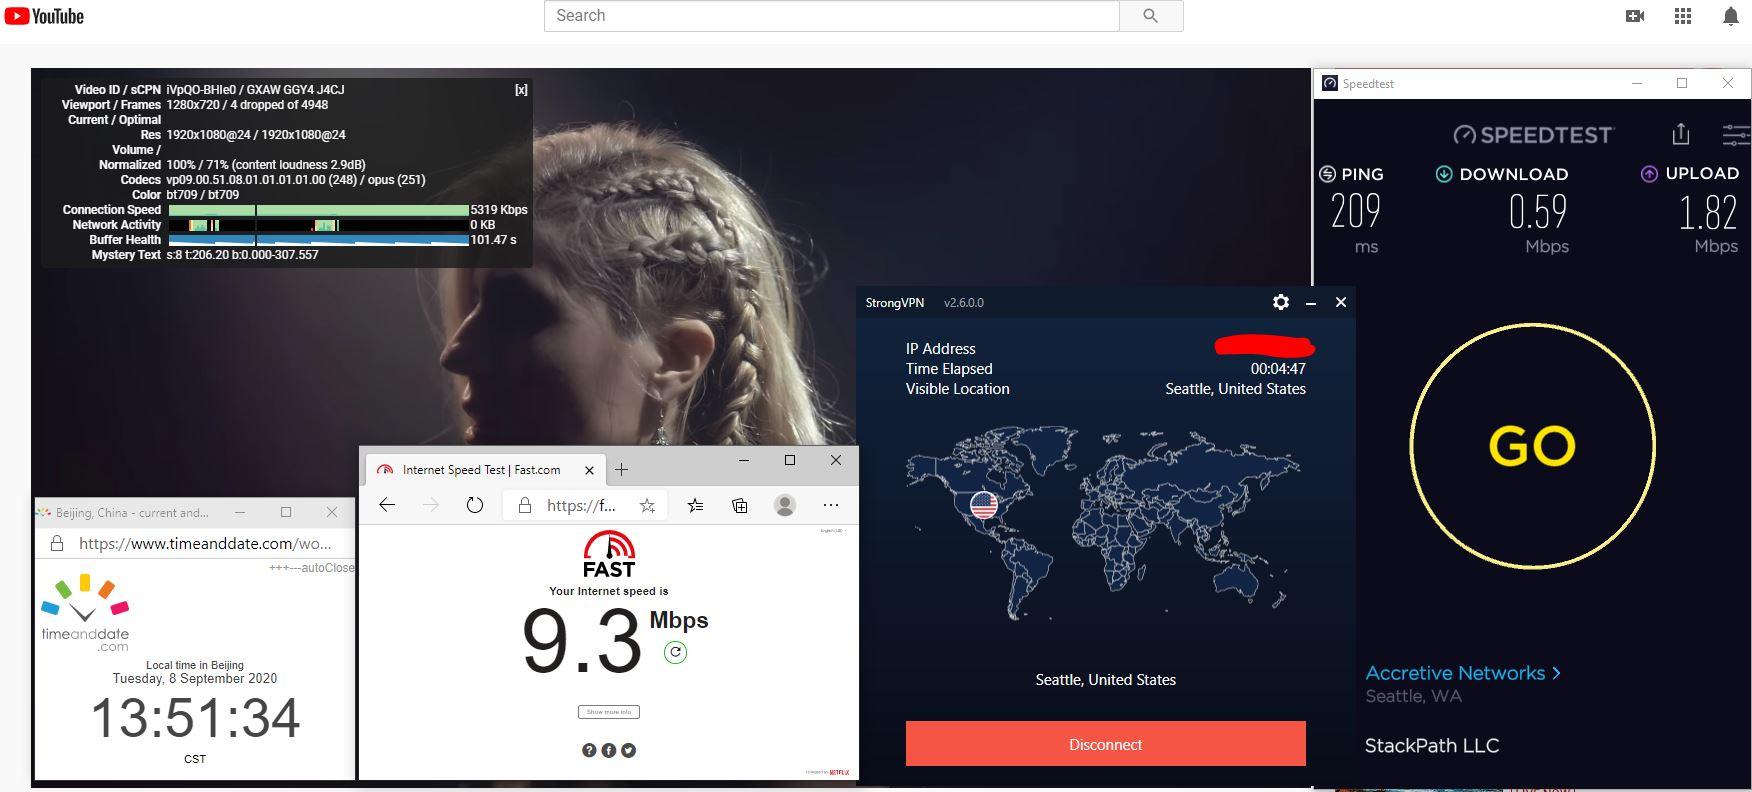 Windows10 StrongVPN USA - Seattle 中国VPN 翻墙 科学上网 翻墙速度测试 - 20200908